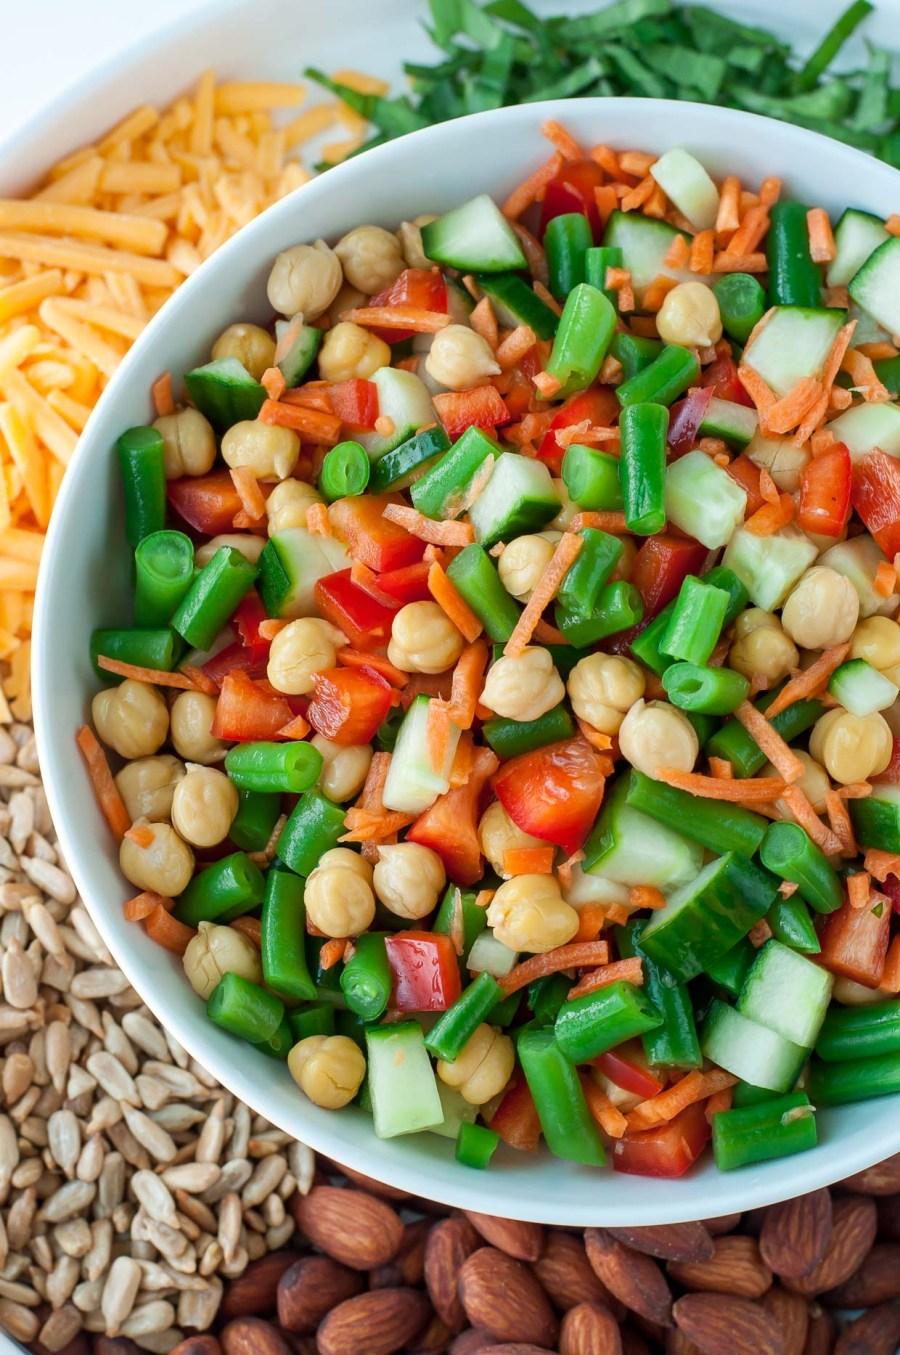 Healthy Chickpea Salad with Basil Vinaigrette Dressing